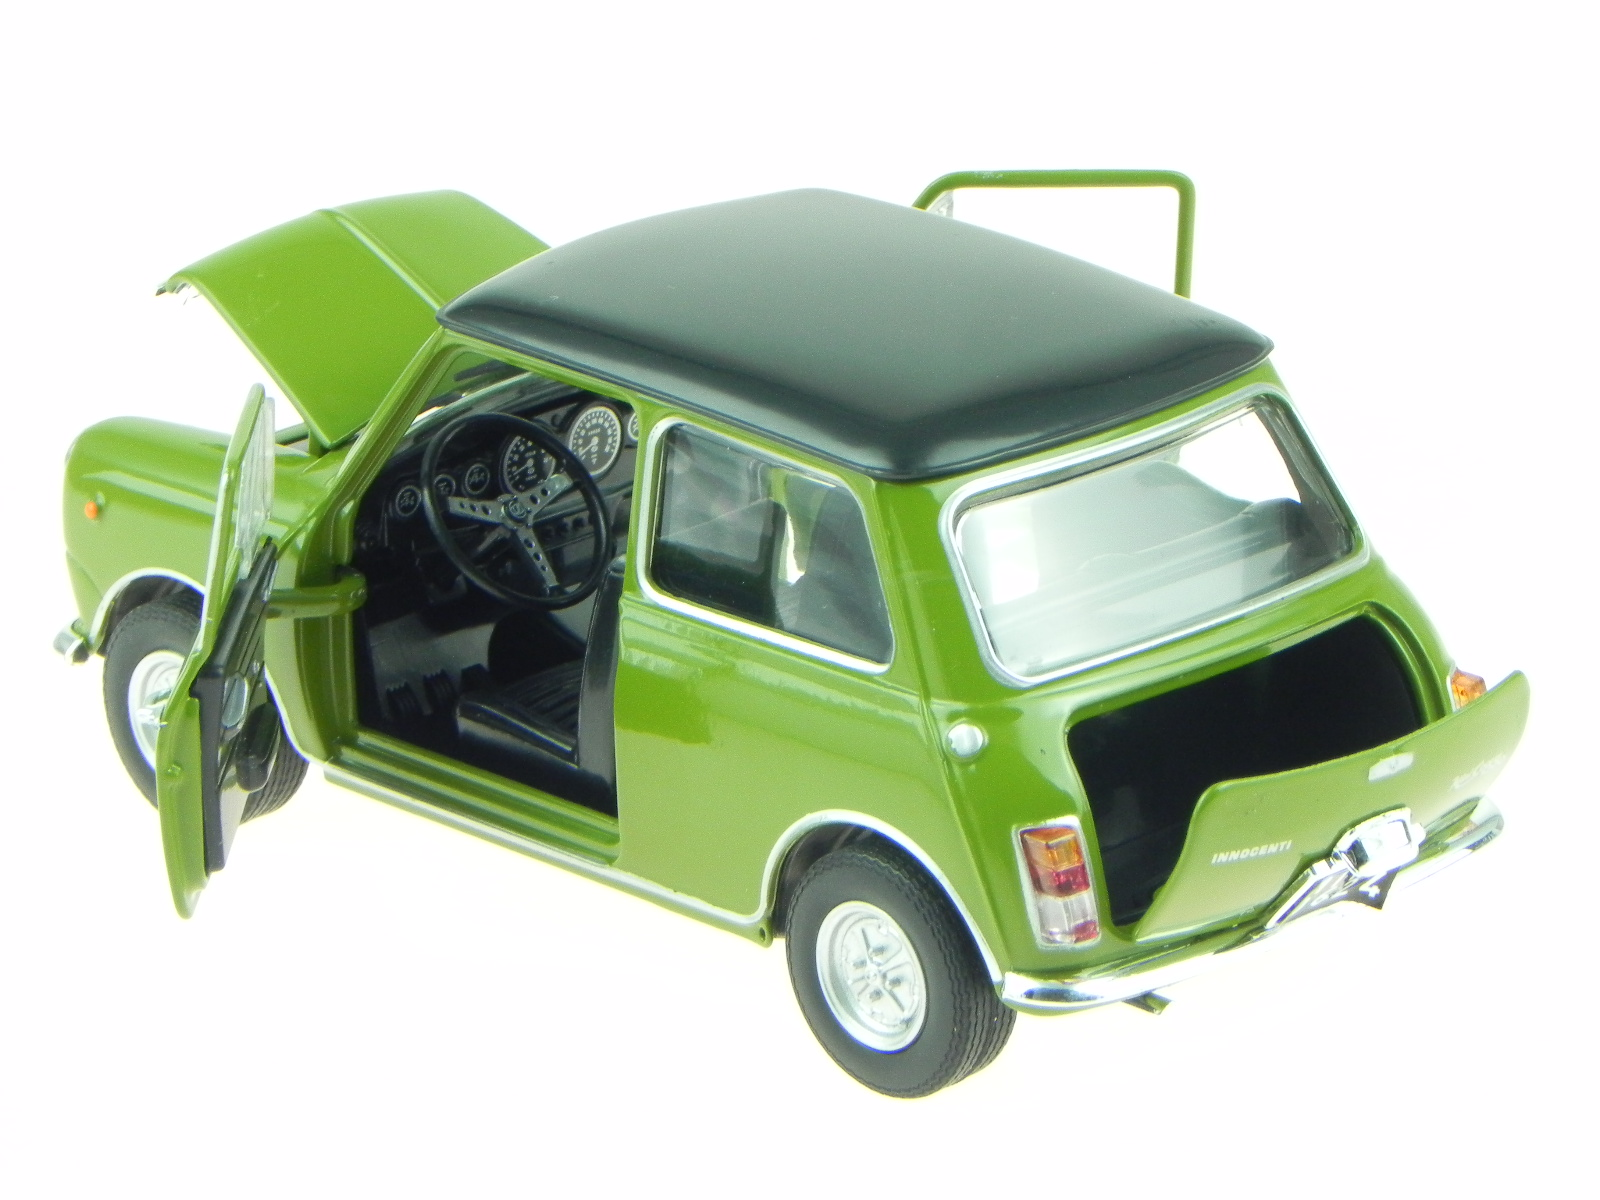 Model Mini Cooper Classic Old MK 3 Green 1972 1:24 Scale Innocenti Leo 1300 Auto, motor: onderdelen, accessoires